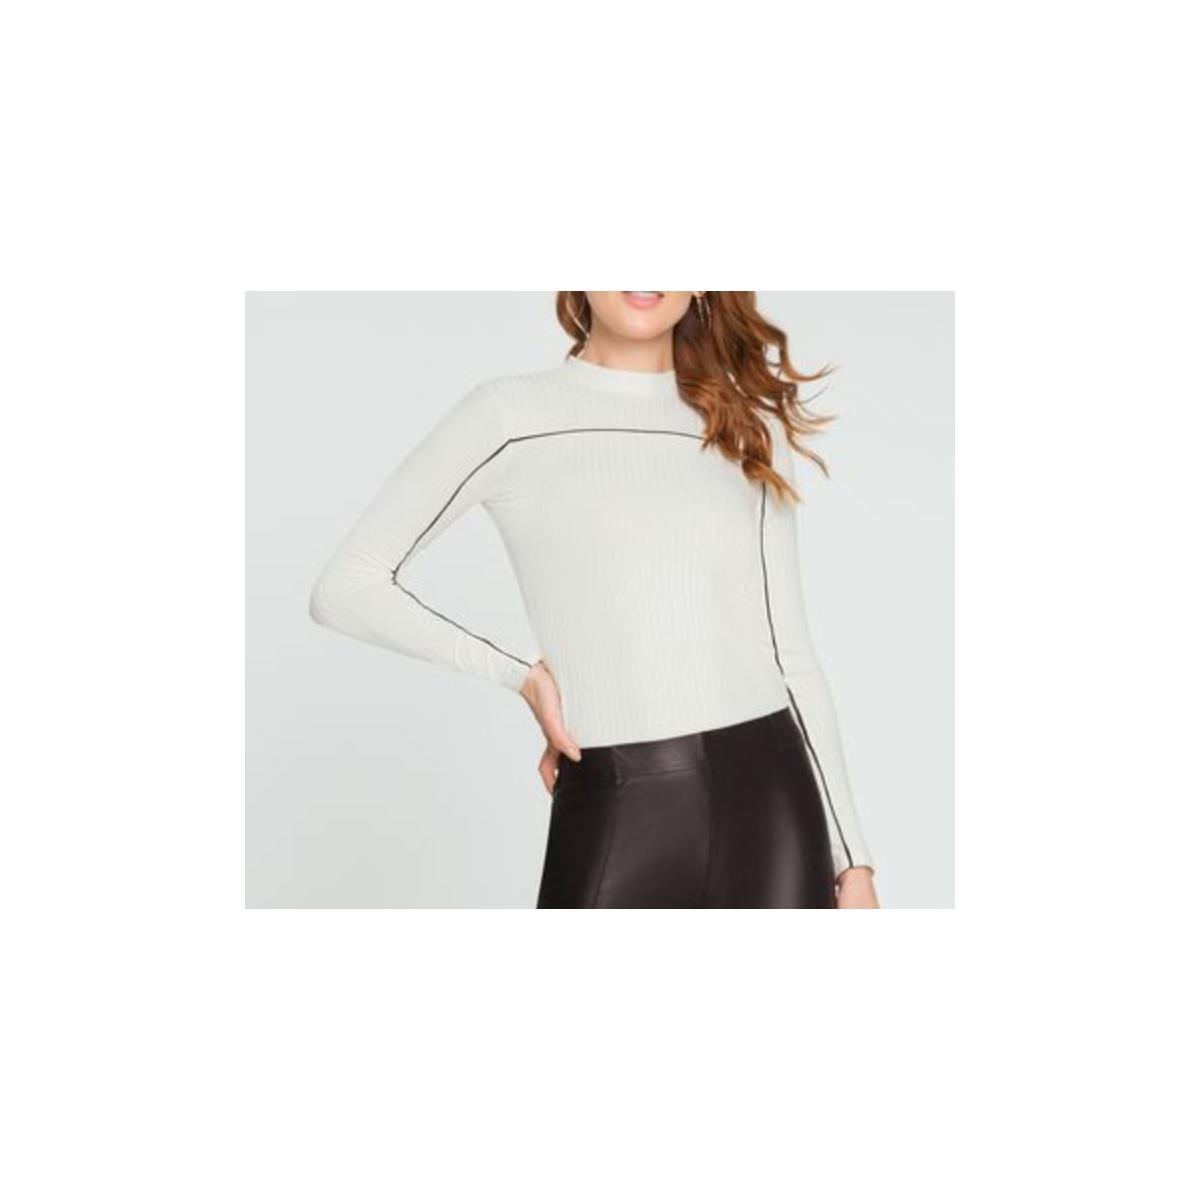 Blusa Feminina Lunender 60092 Off White